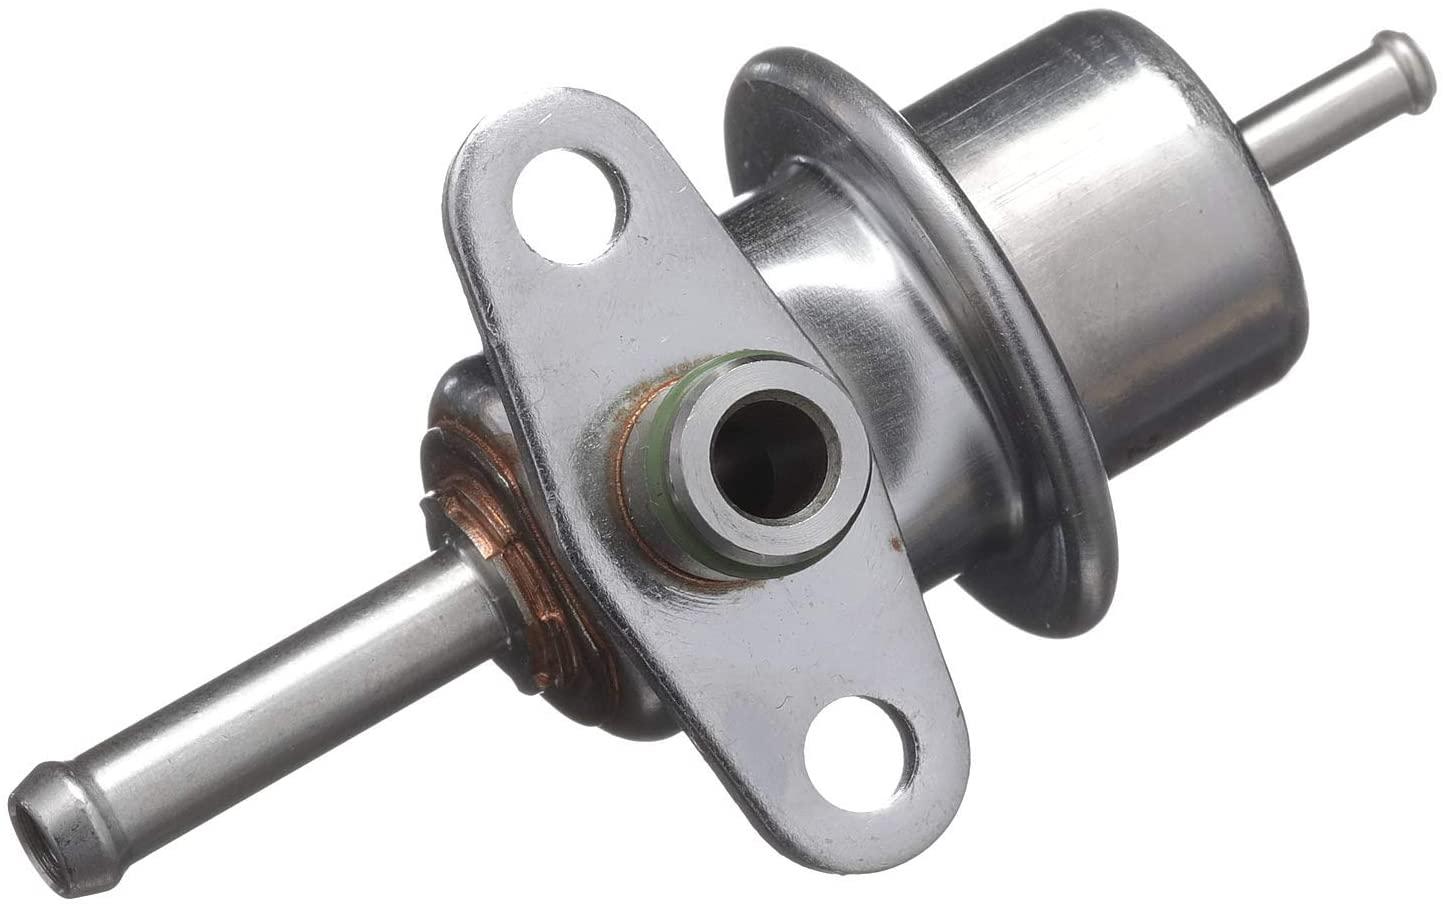 Delphi FP10411 Fuel Pressure Regulator, 1 Pack